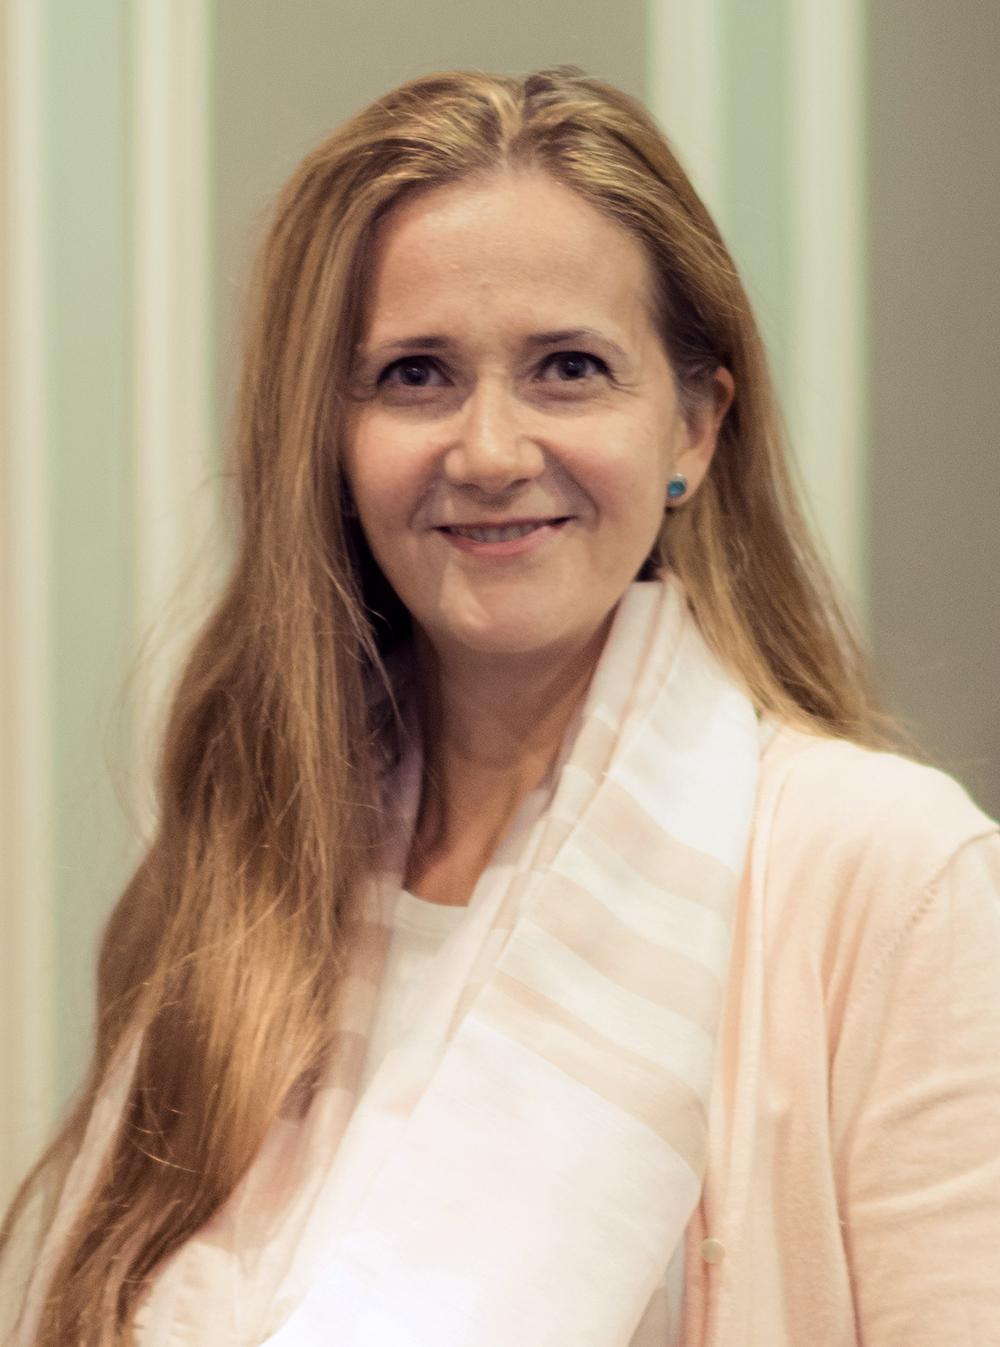 Дарья Эллиот «Директор Connexus Academic Advisors»